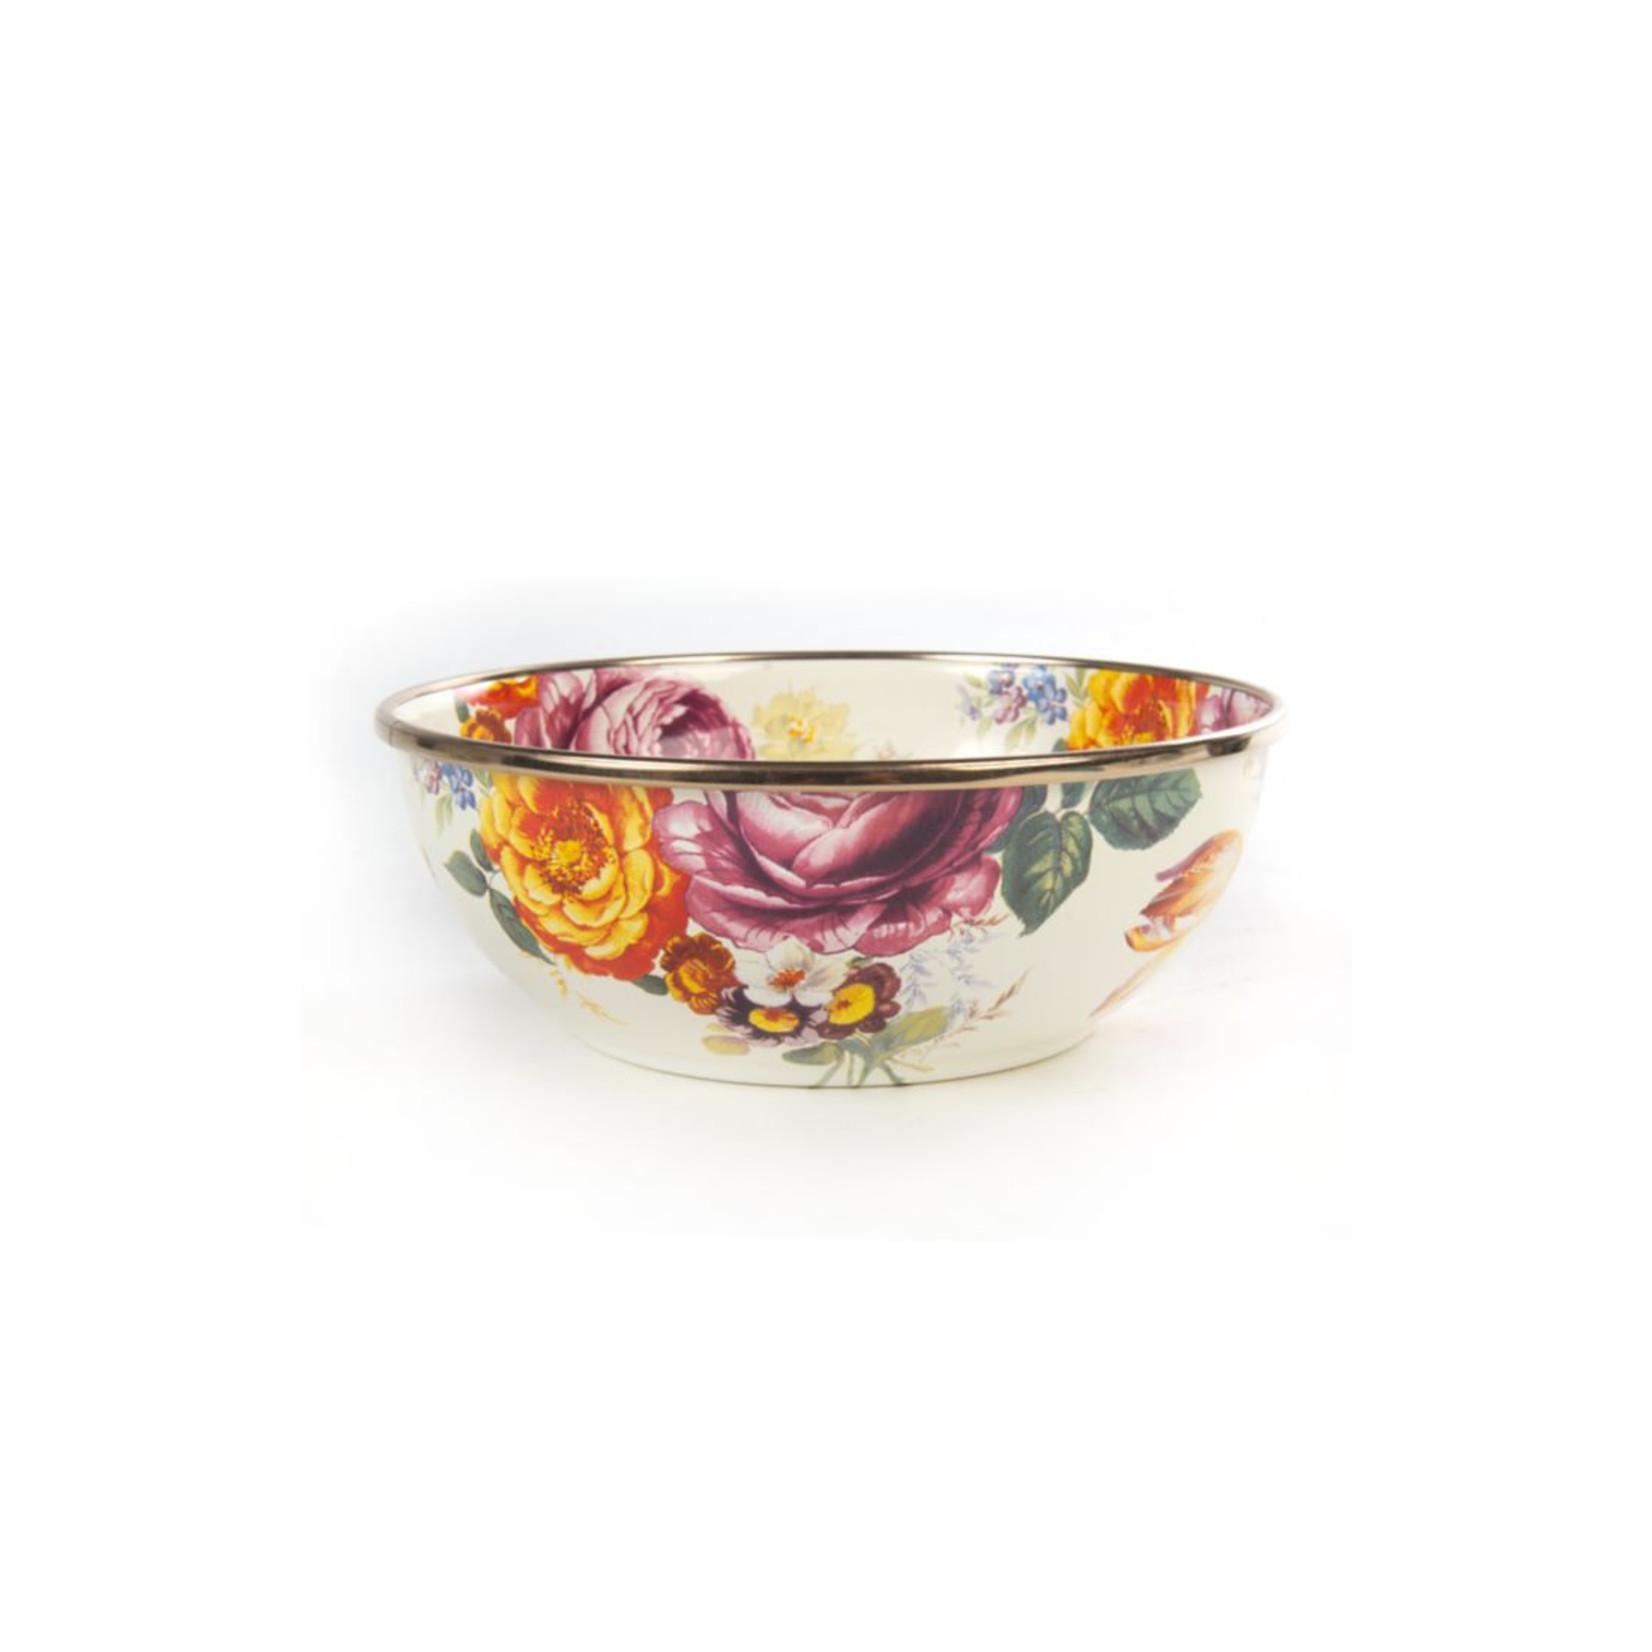 MacKenzie Childs Flower Market Everyday Bowl - White